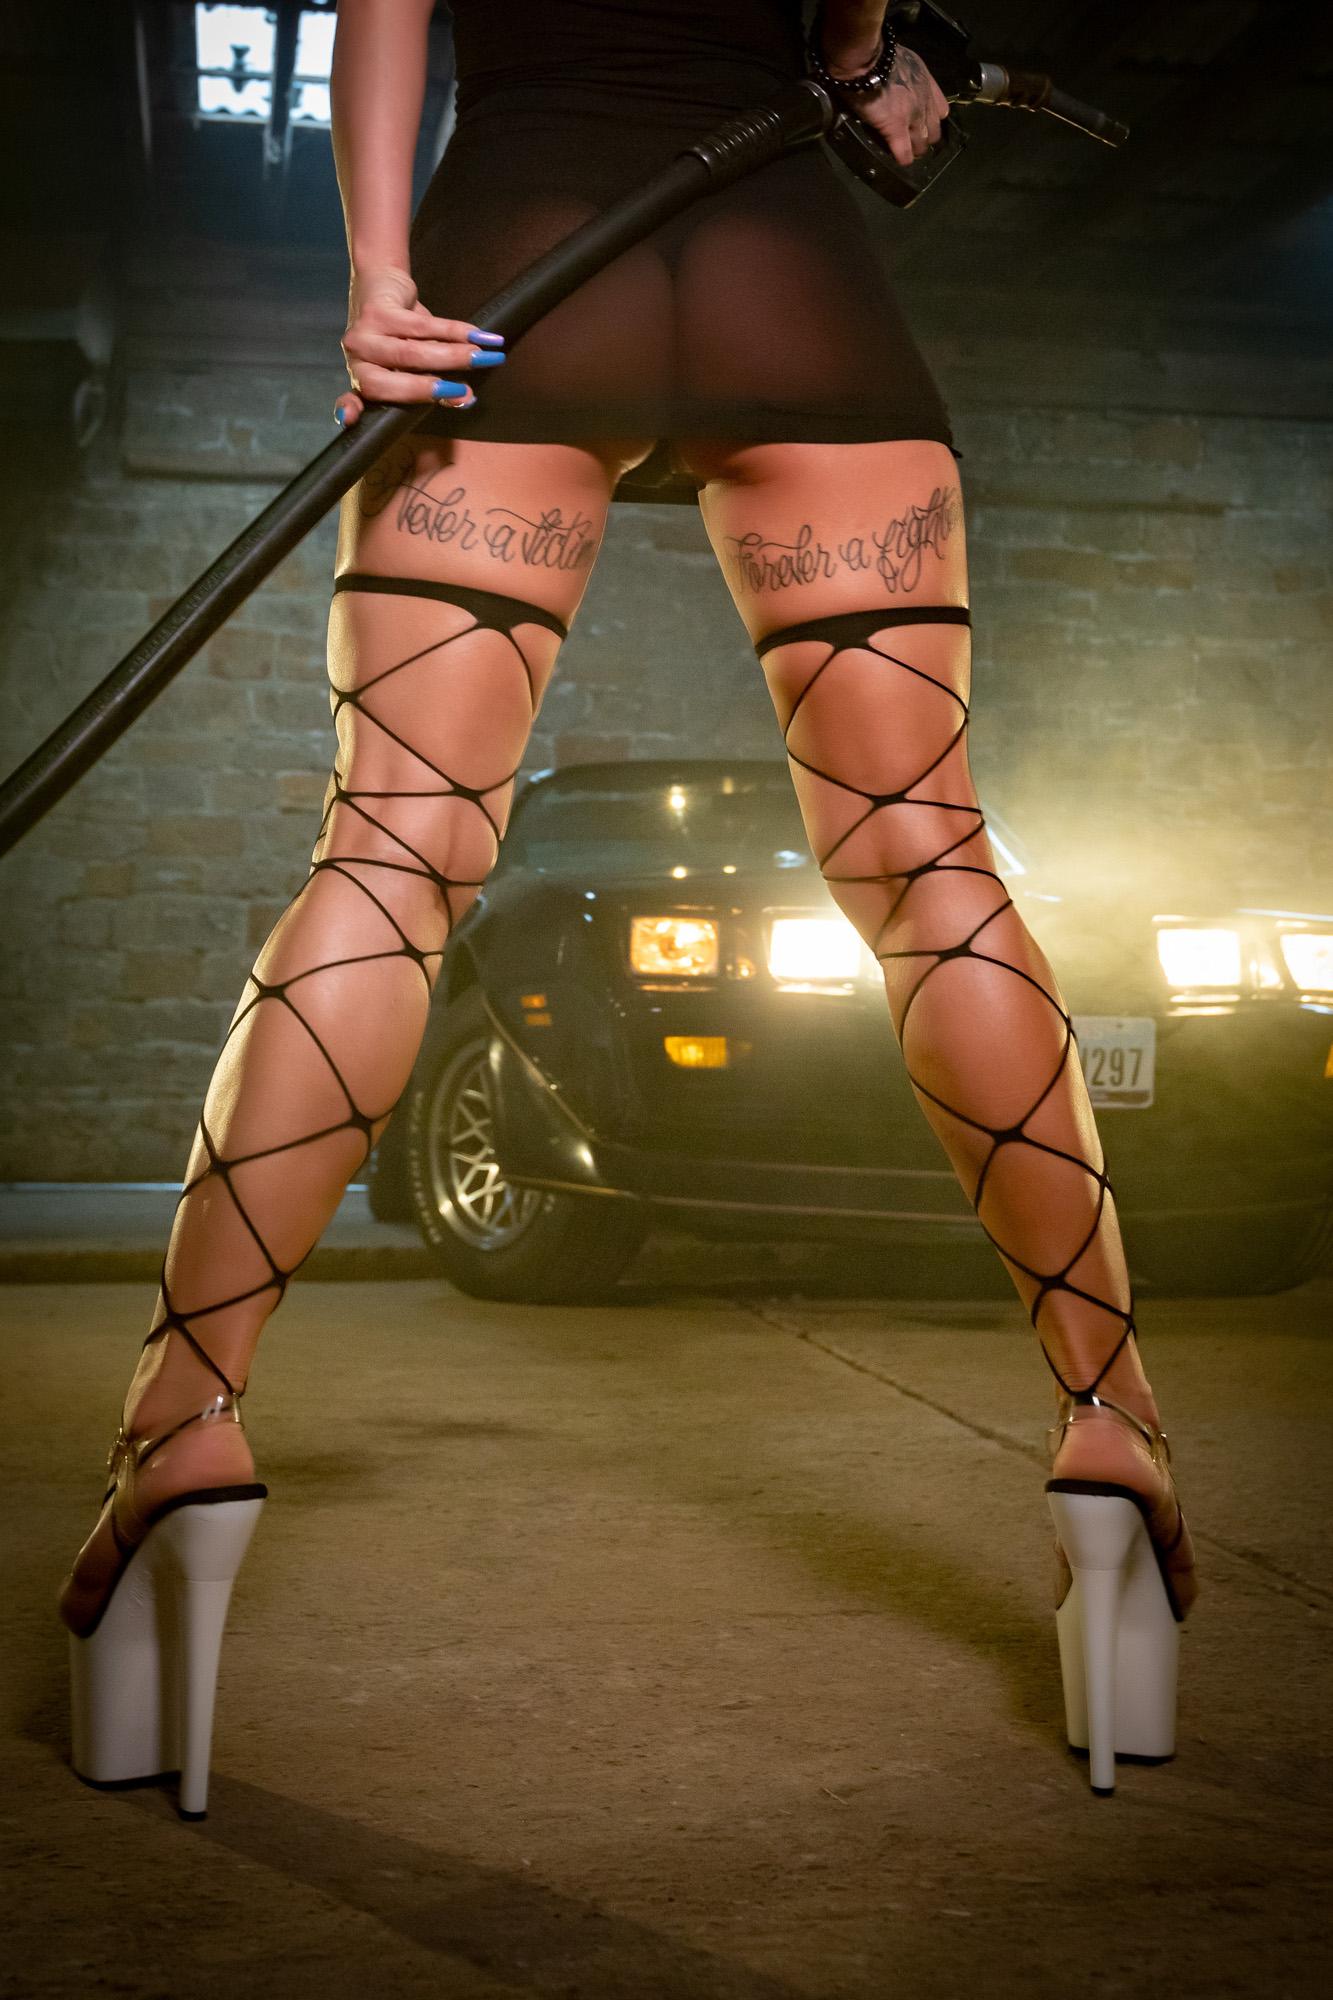 Pontiac Trans Am Girl